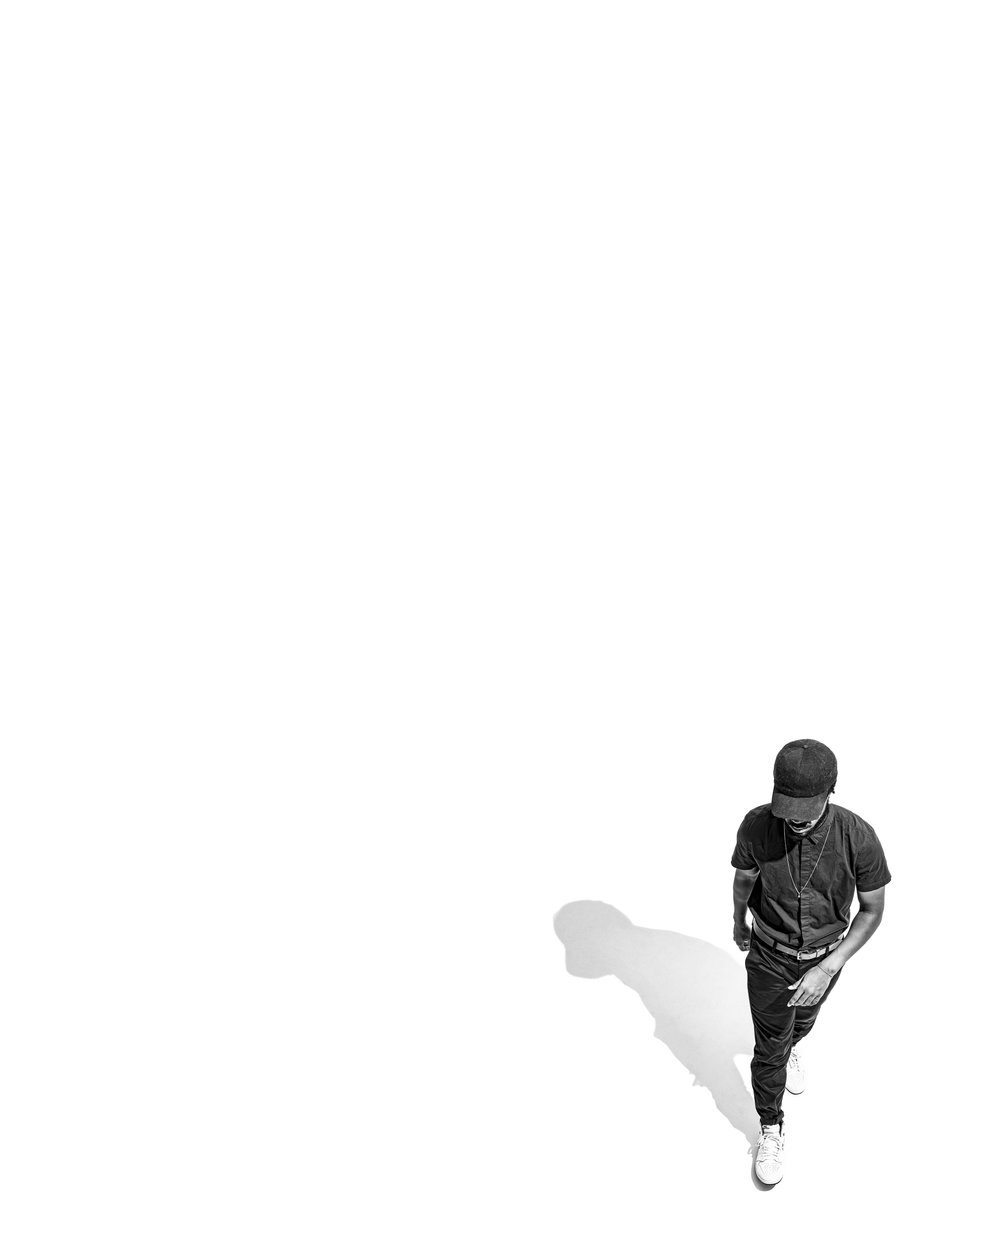 KZA_Walking.jpg